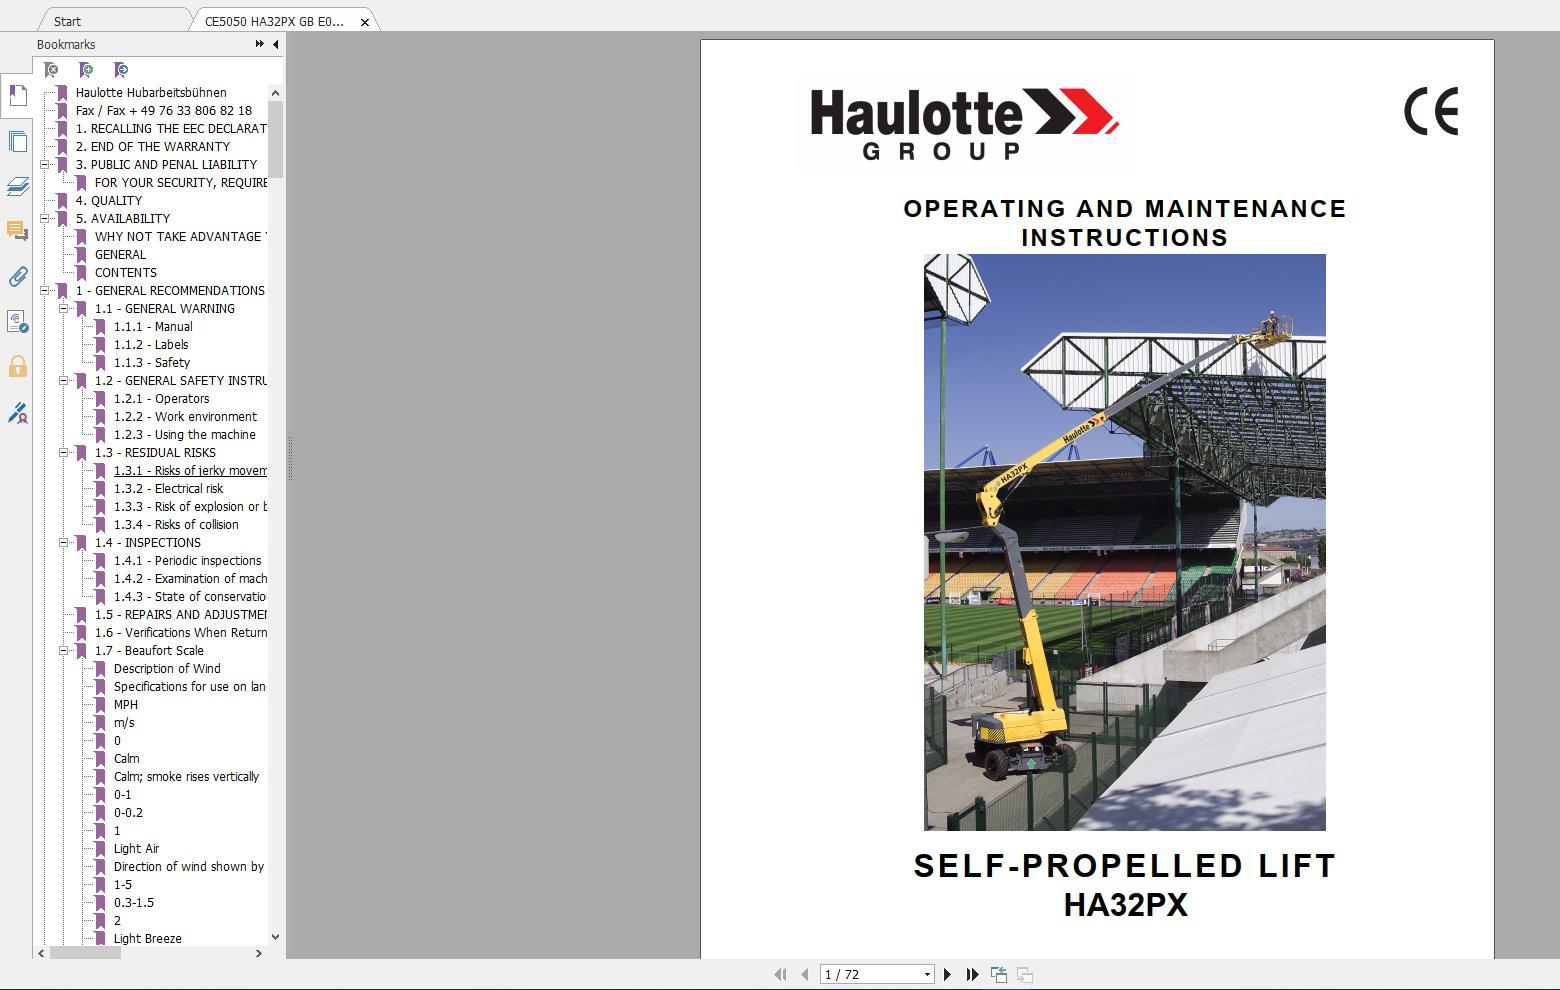 Haulotte_Work_Platforms_and_Telehandlers_Service_Maintenance_Operators_Manual_Training_Spare_Parts_Manual_DVD12